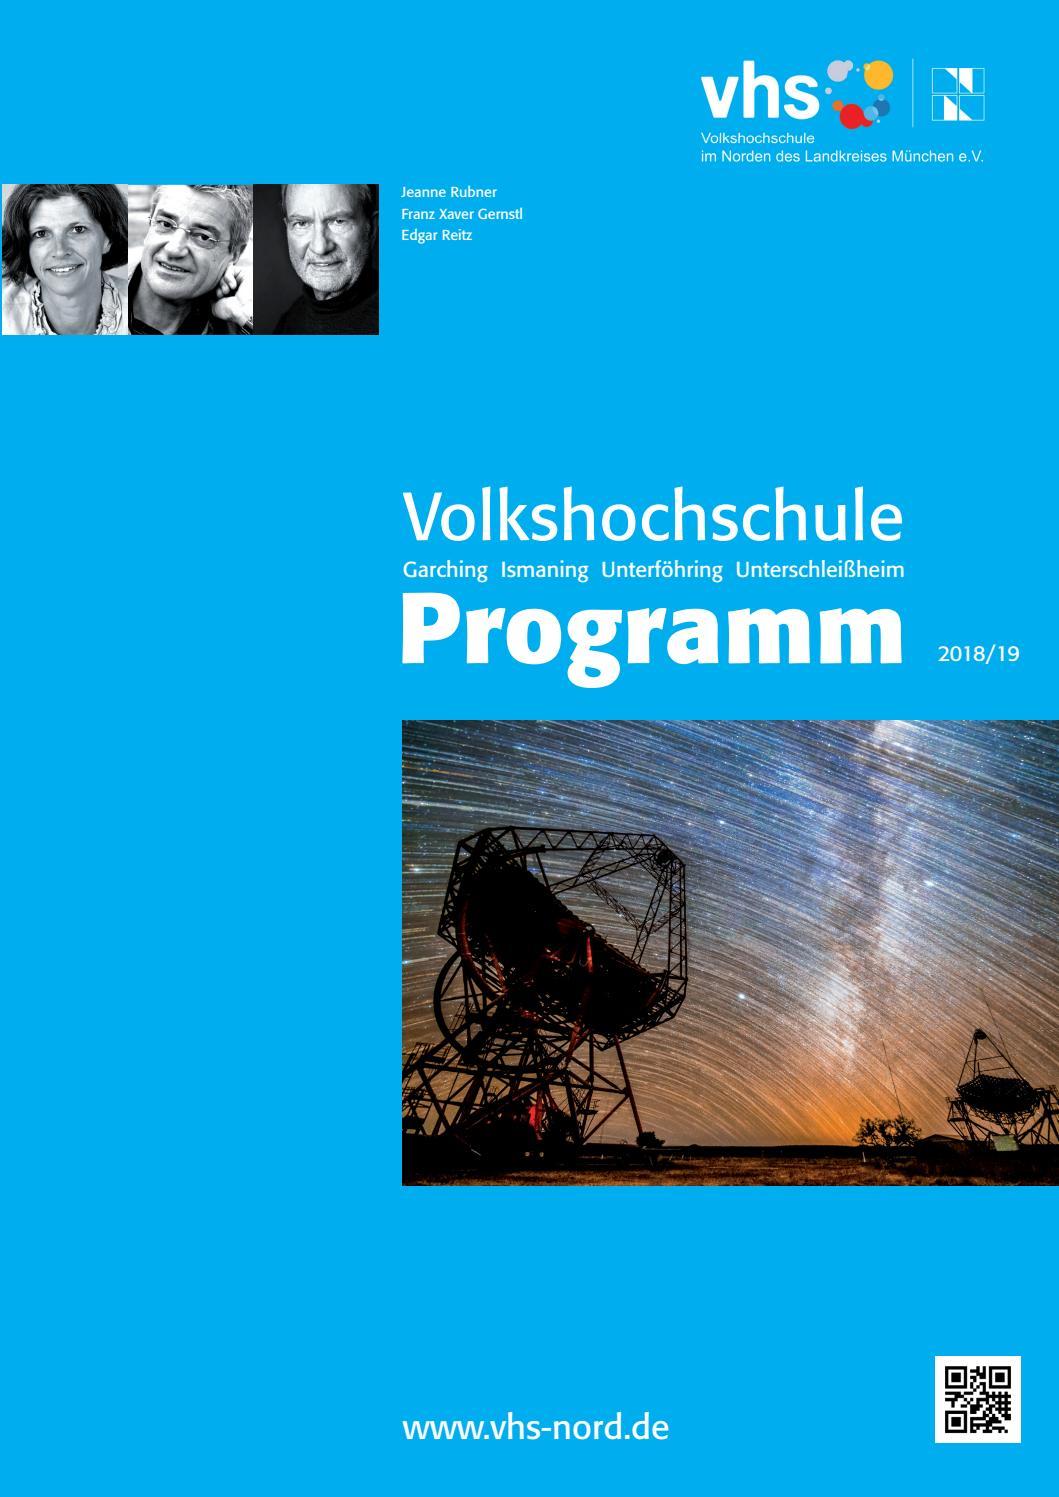 f70e14f3a8aa6e Vhs Nord, Programmheft Herbst/Winter 2018/19 by vhs im Norden des  Landkreises München e.V. - issuu